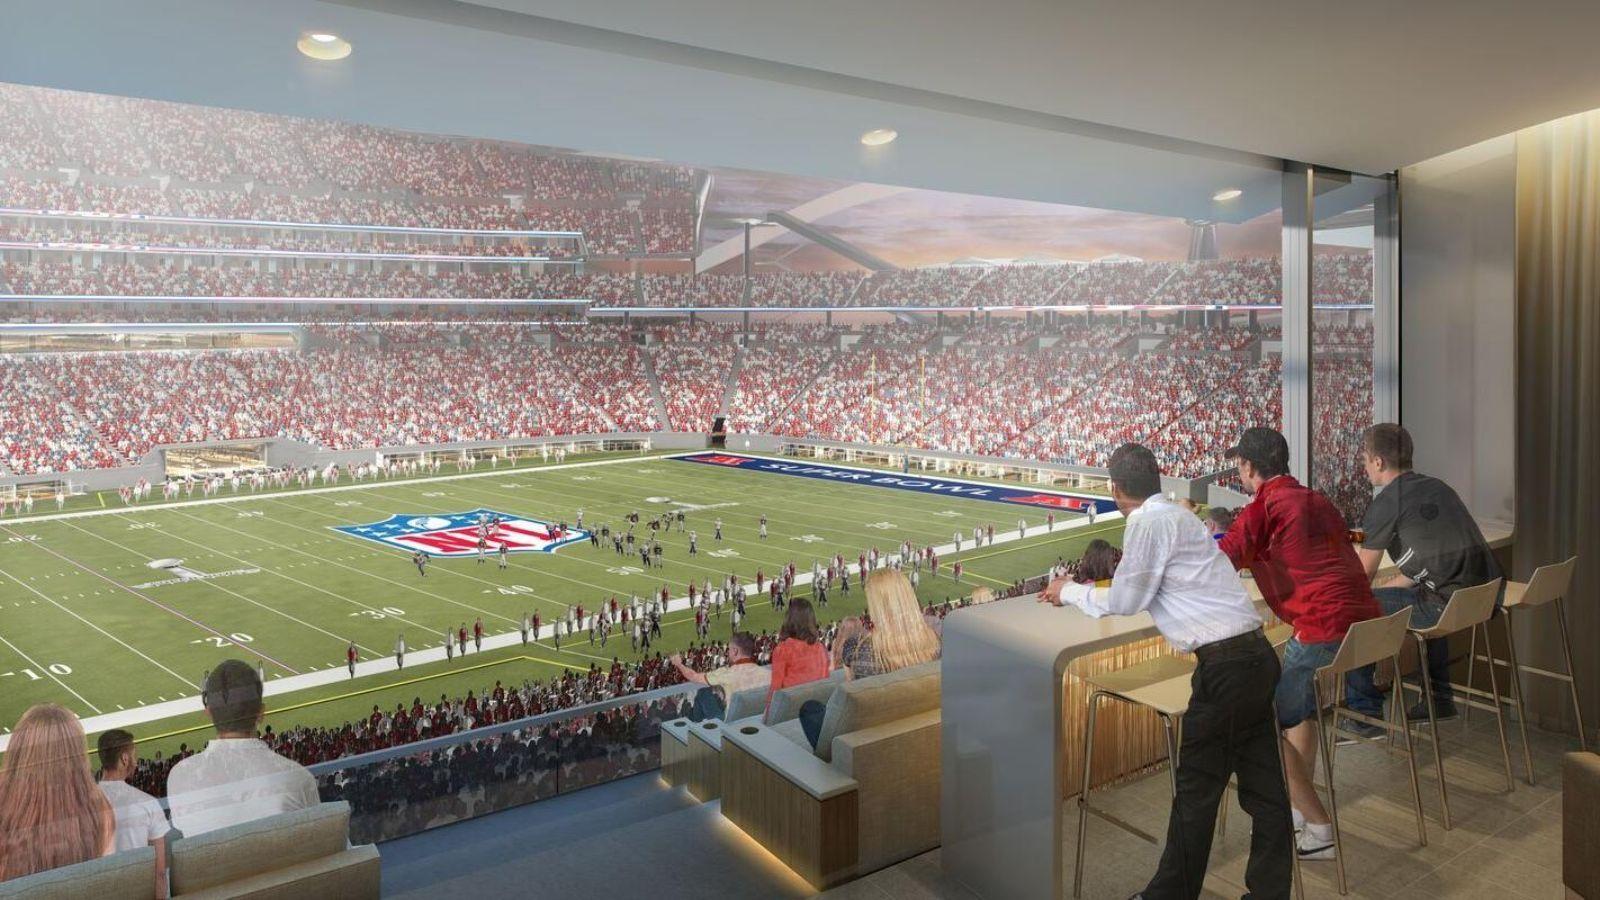 Los Angeles Stadium Stadium design, Stadium, Football